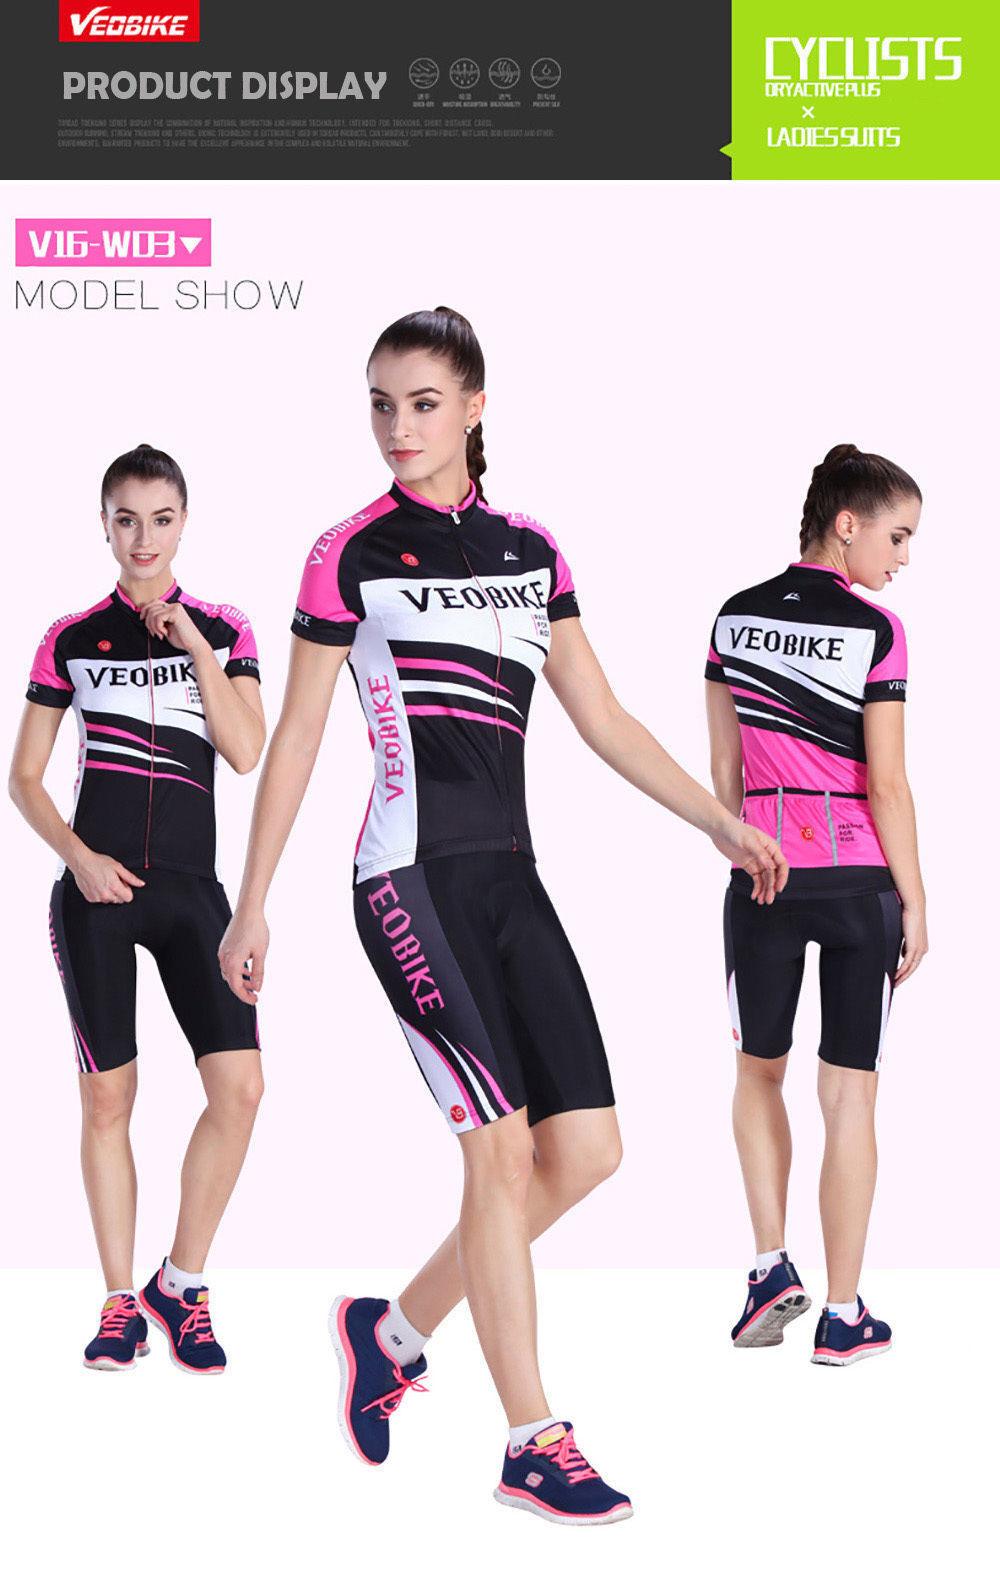 Bike woman Cycling Bicycle Jerseys Shirt Pant  Set Outdoor Sports Team  YF517  high quality genuine